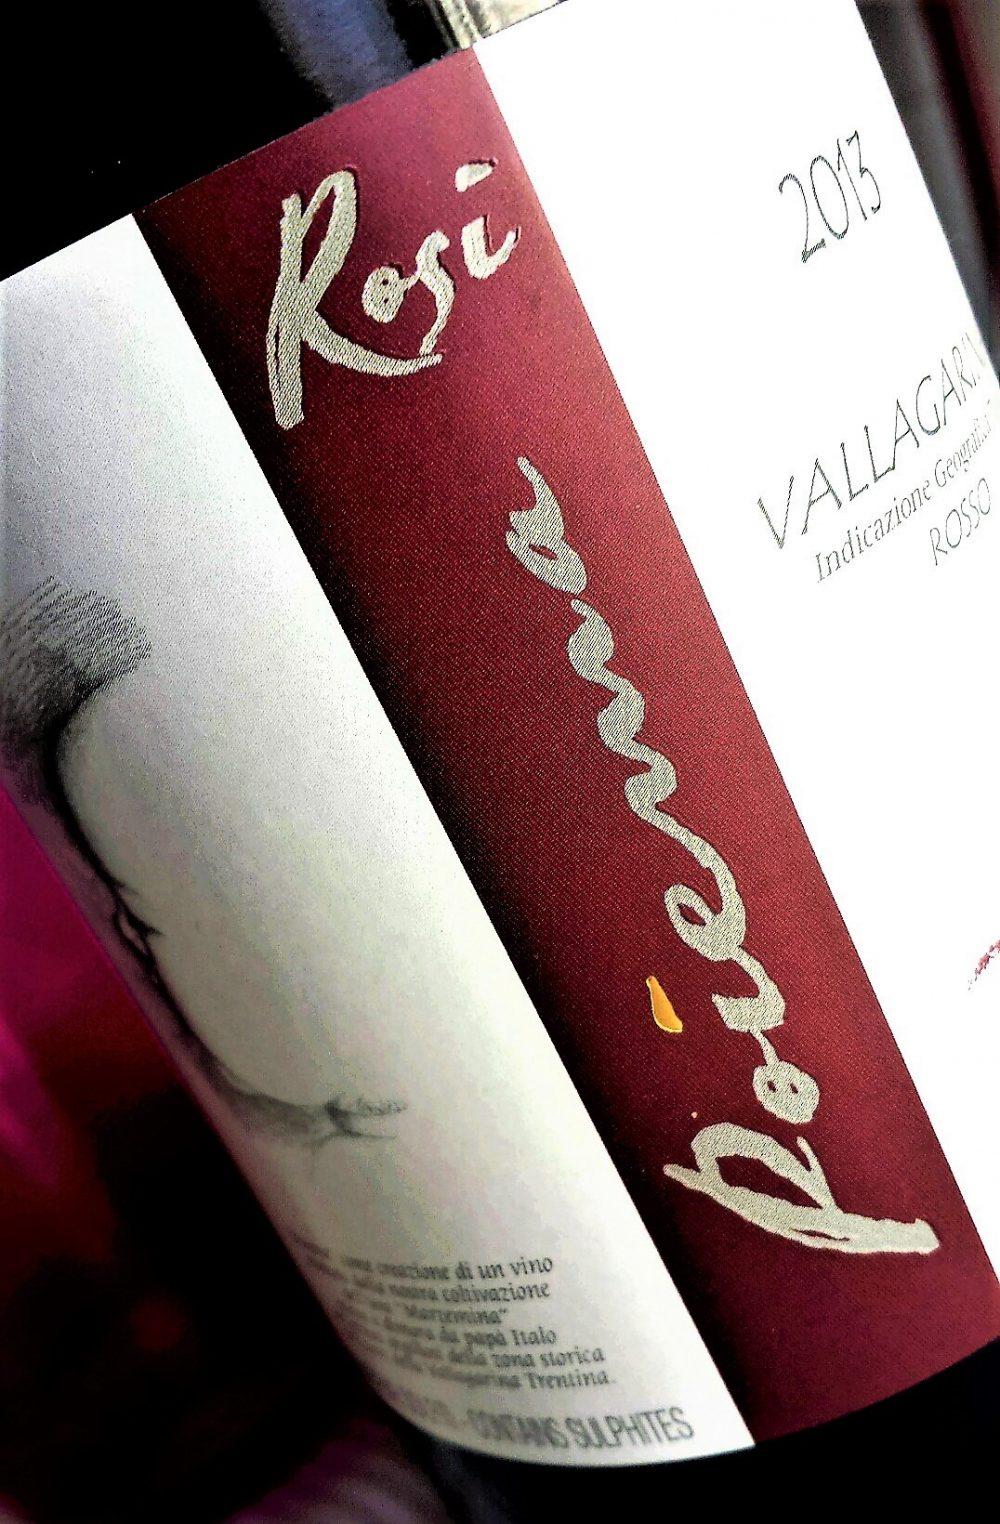 Vallagarina Rosso Poiema 2013, Eugenio Rosi